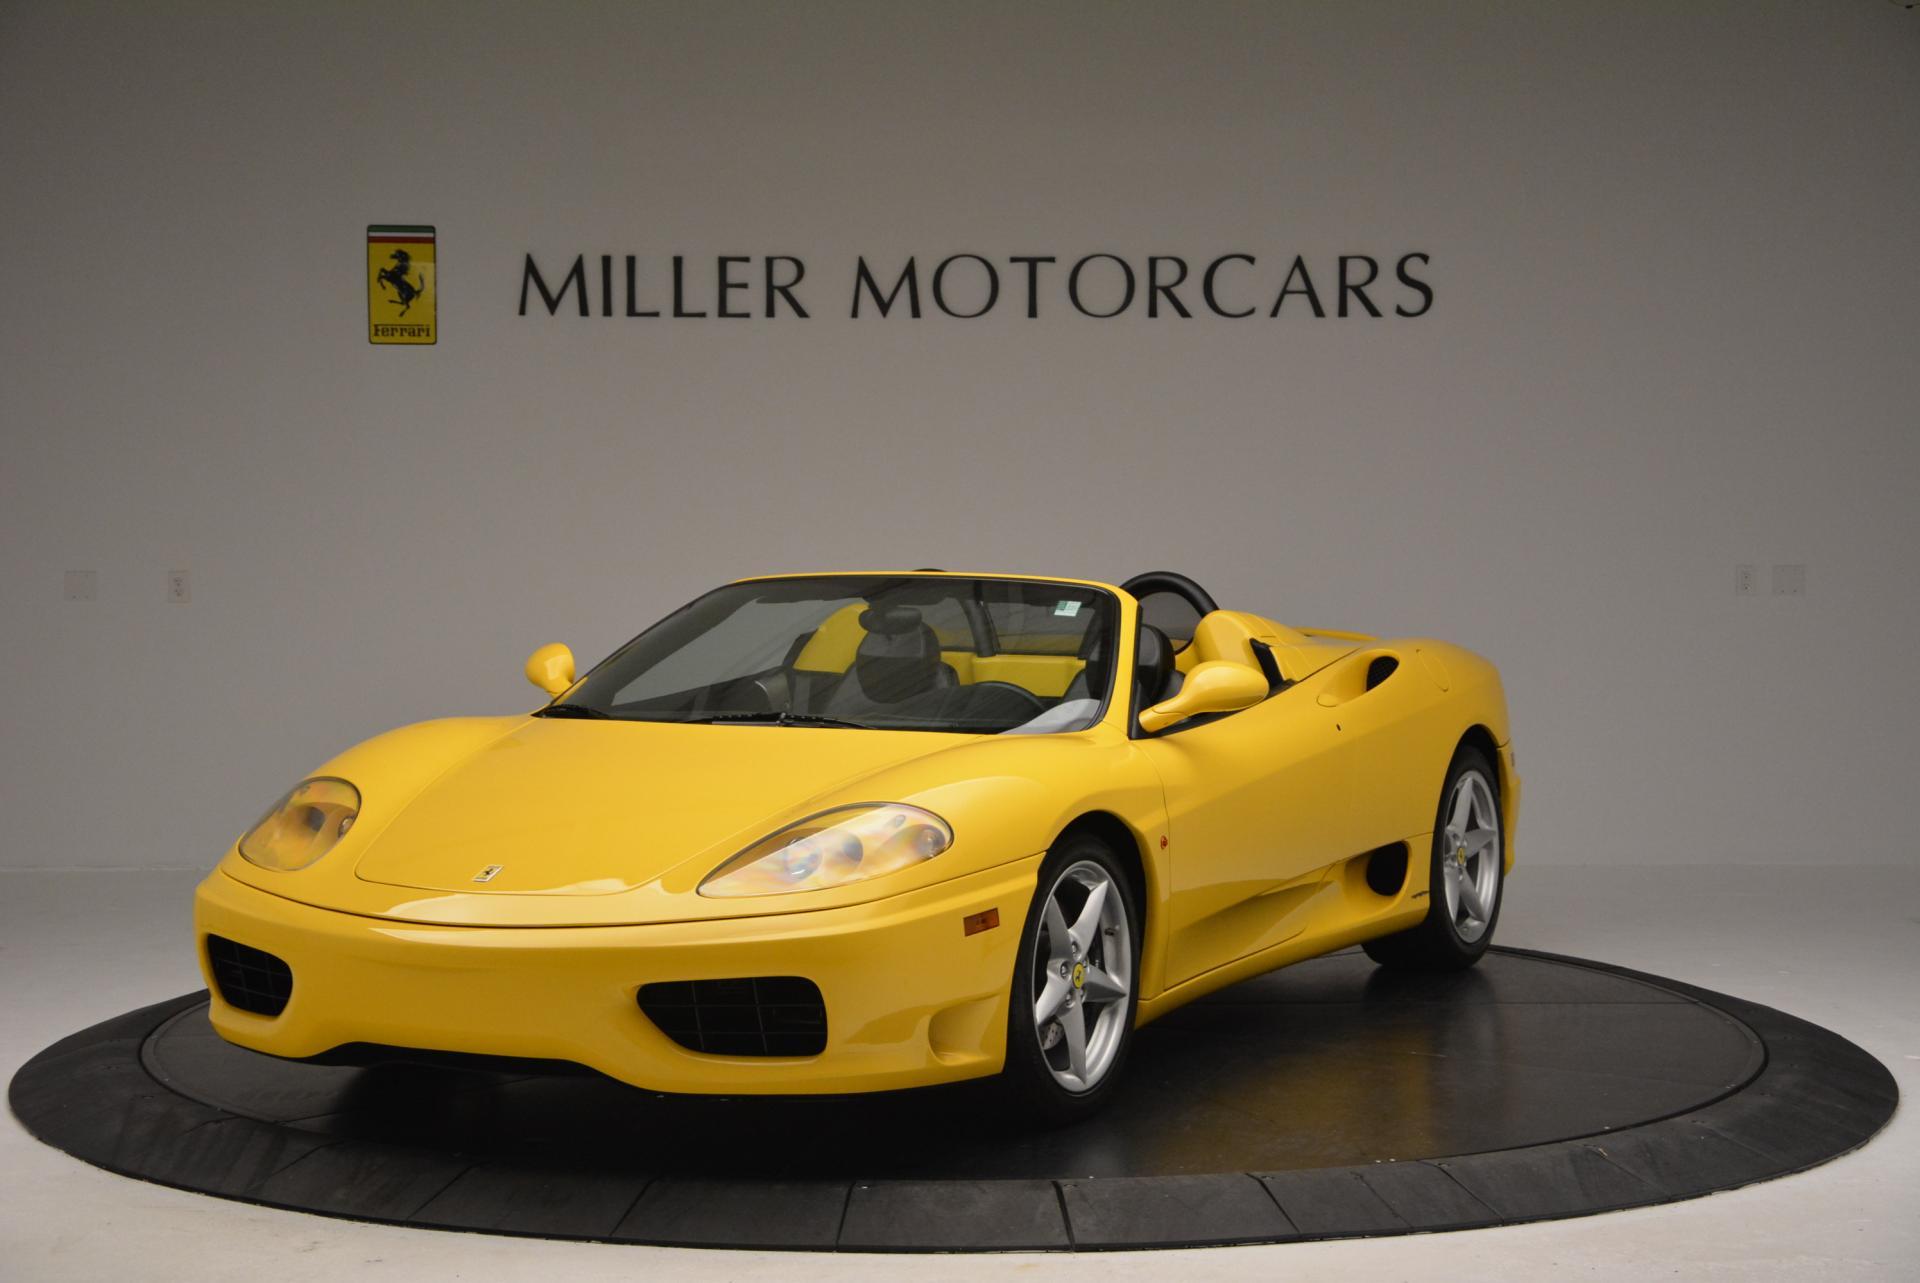 Used 2003 Ferrari 360 Spider 6-Speed Manual  For Sale In Greenwich, CT. Alfa Romeo of Greenwich, 4239A 127_main